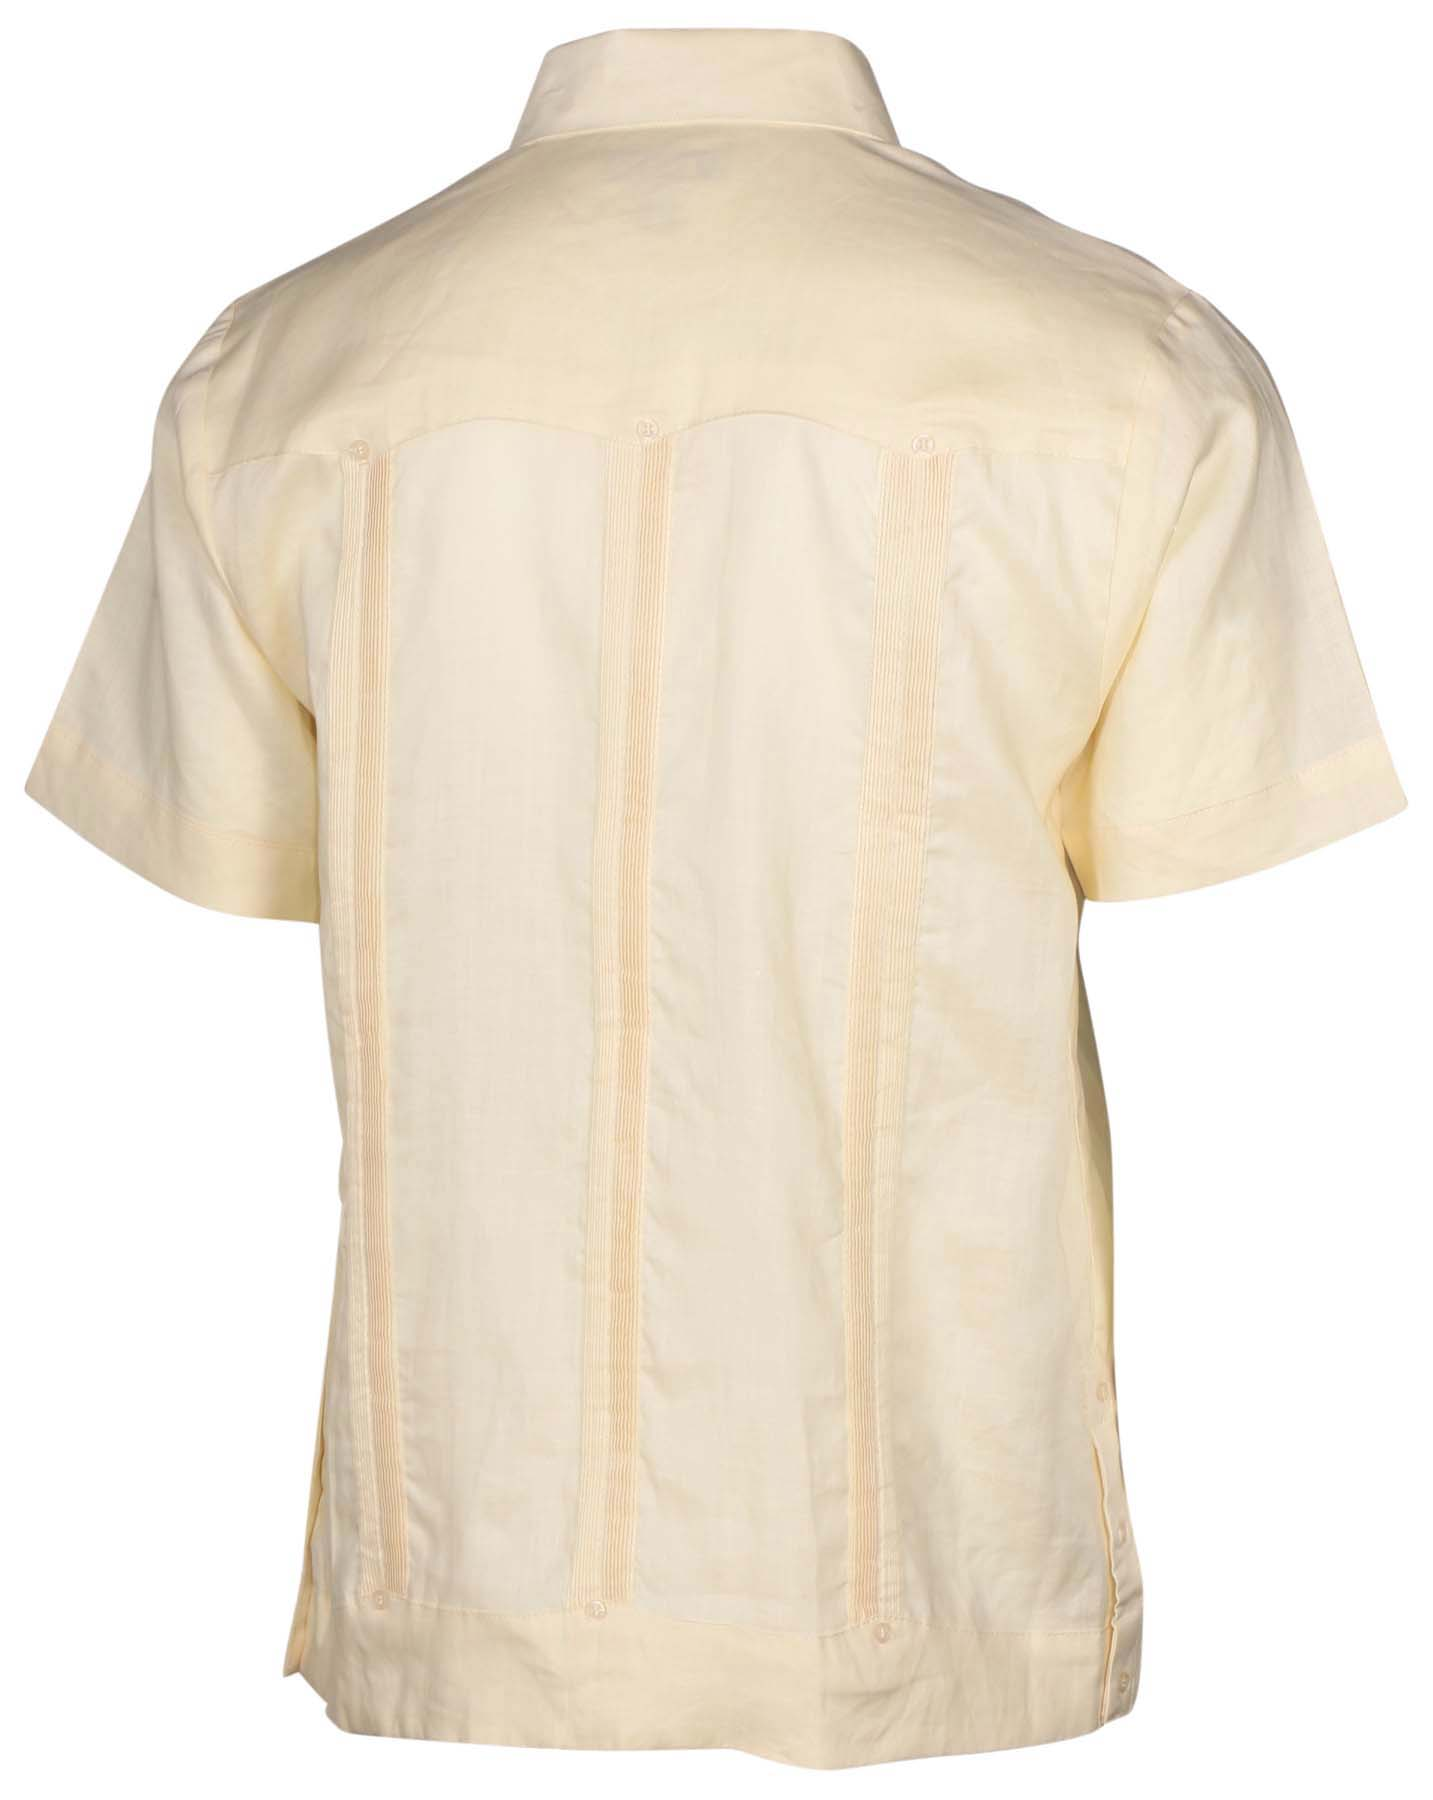 Mojito Collection Men 39 S Big Tall Linen Guayabera Shirt